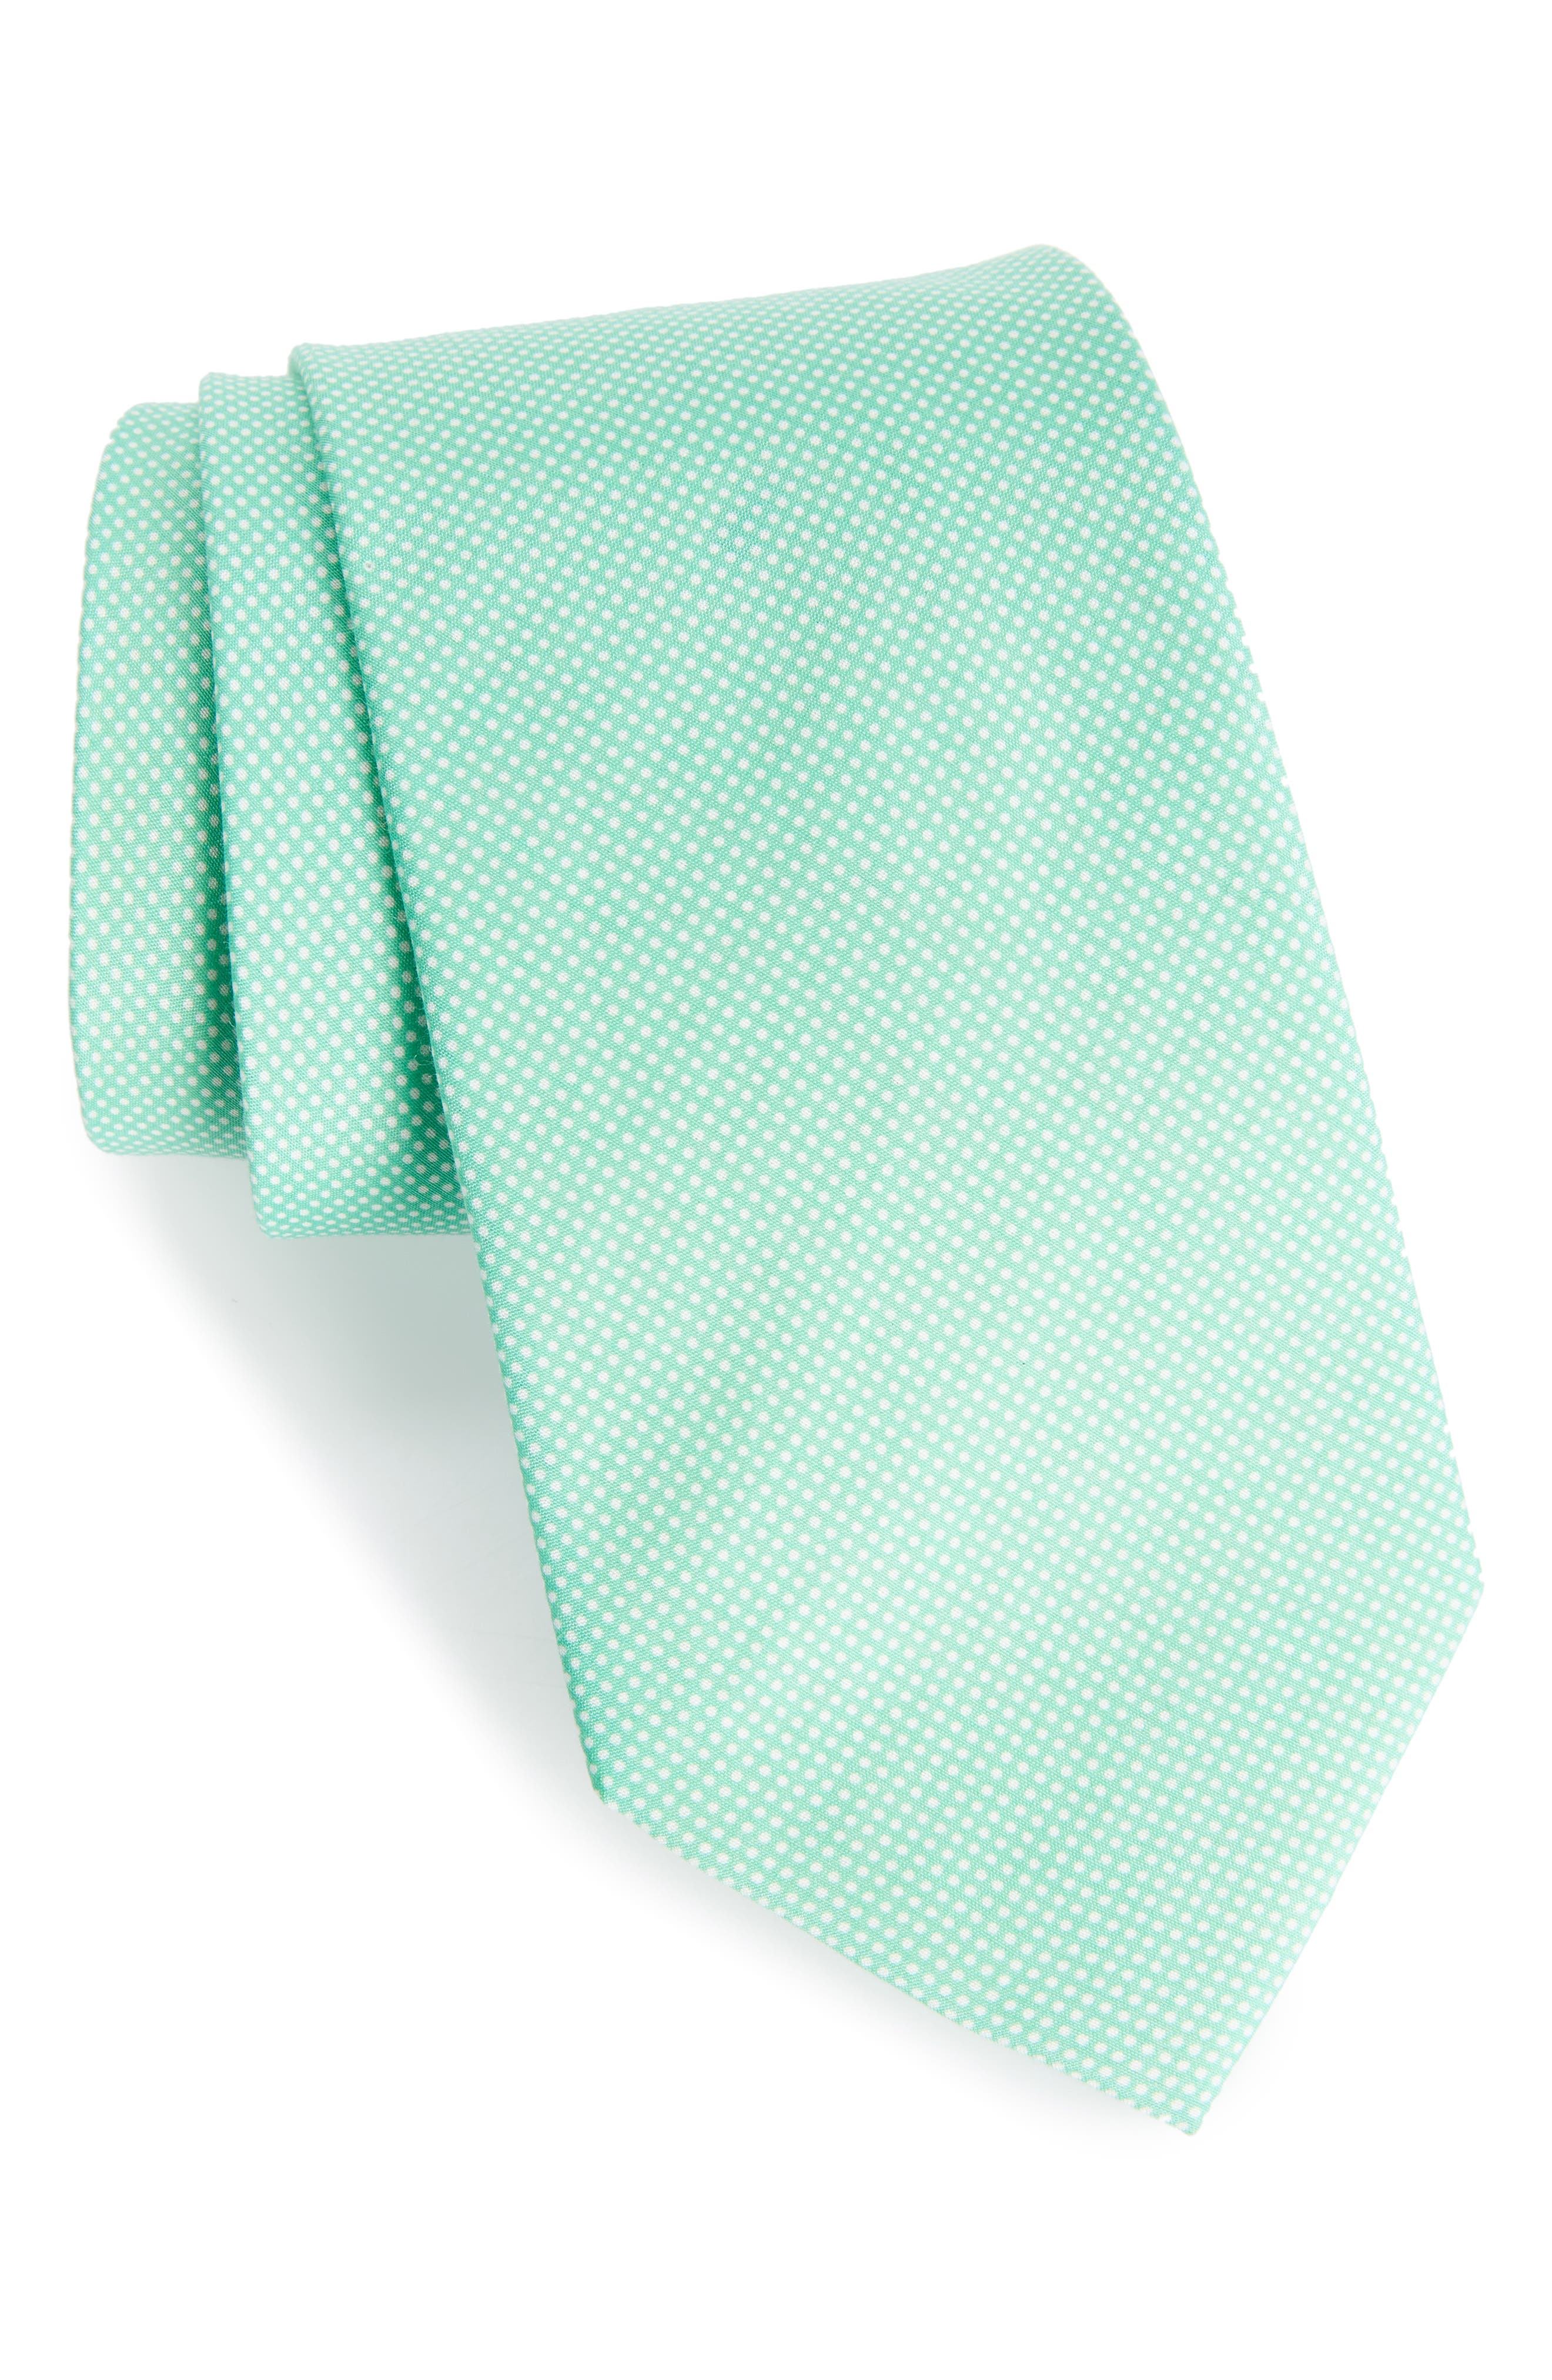 Dapper Dots Cotton & Silk Tie,                             Main thumbnail 1, color,                             Green